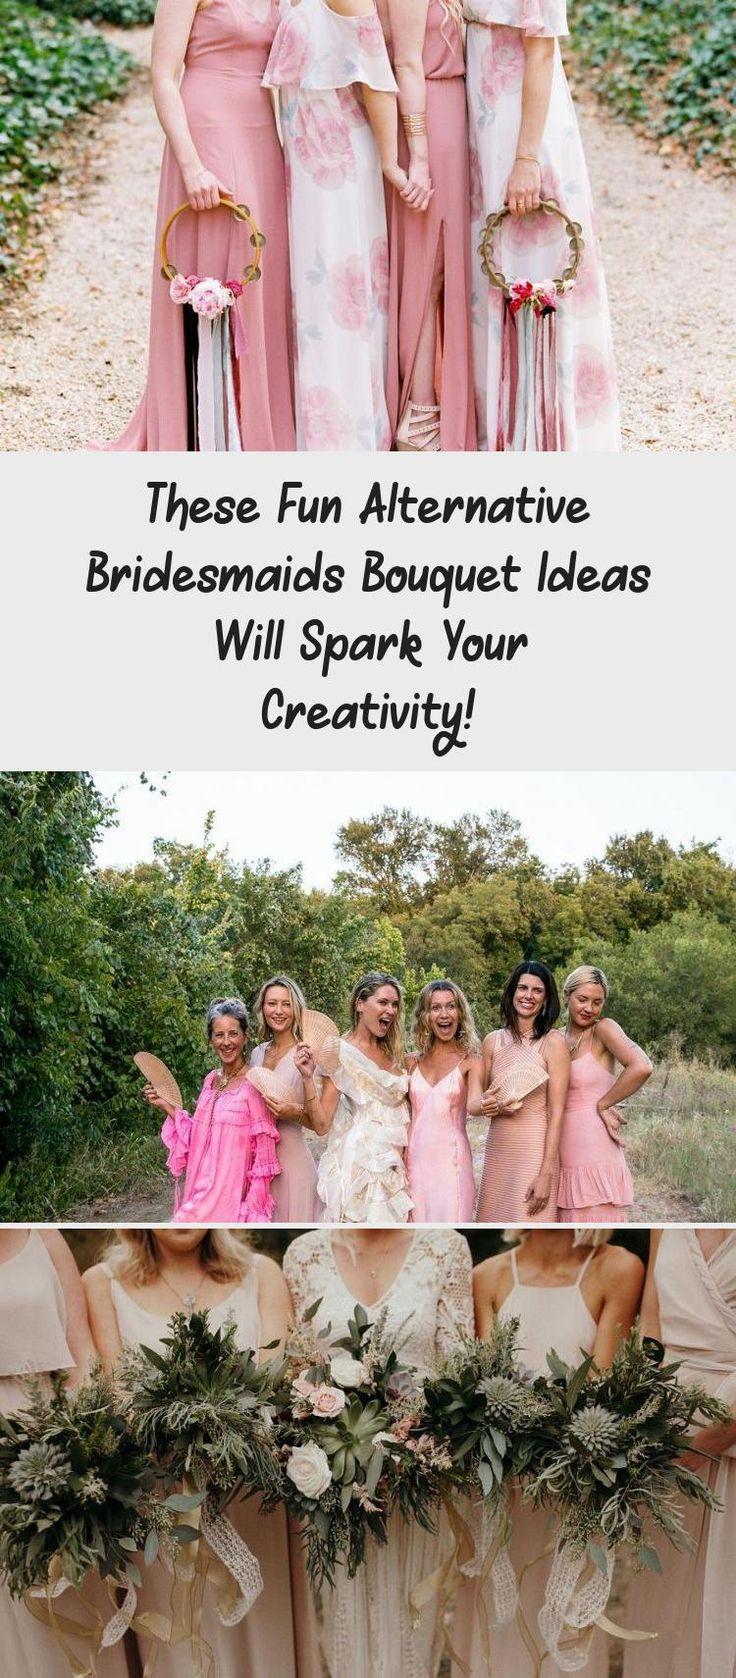 These Fun Alternative Bridesmaids Bouquet Ideas Will Spark Your Creativity! - Green Wedding Shoes #BridesmaidDressesBeach #BridesmaidDresses2018 #BridesmaidDressesWinter #TanBridesmaidDresses #BridesmaidDressesShort